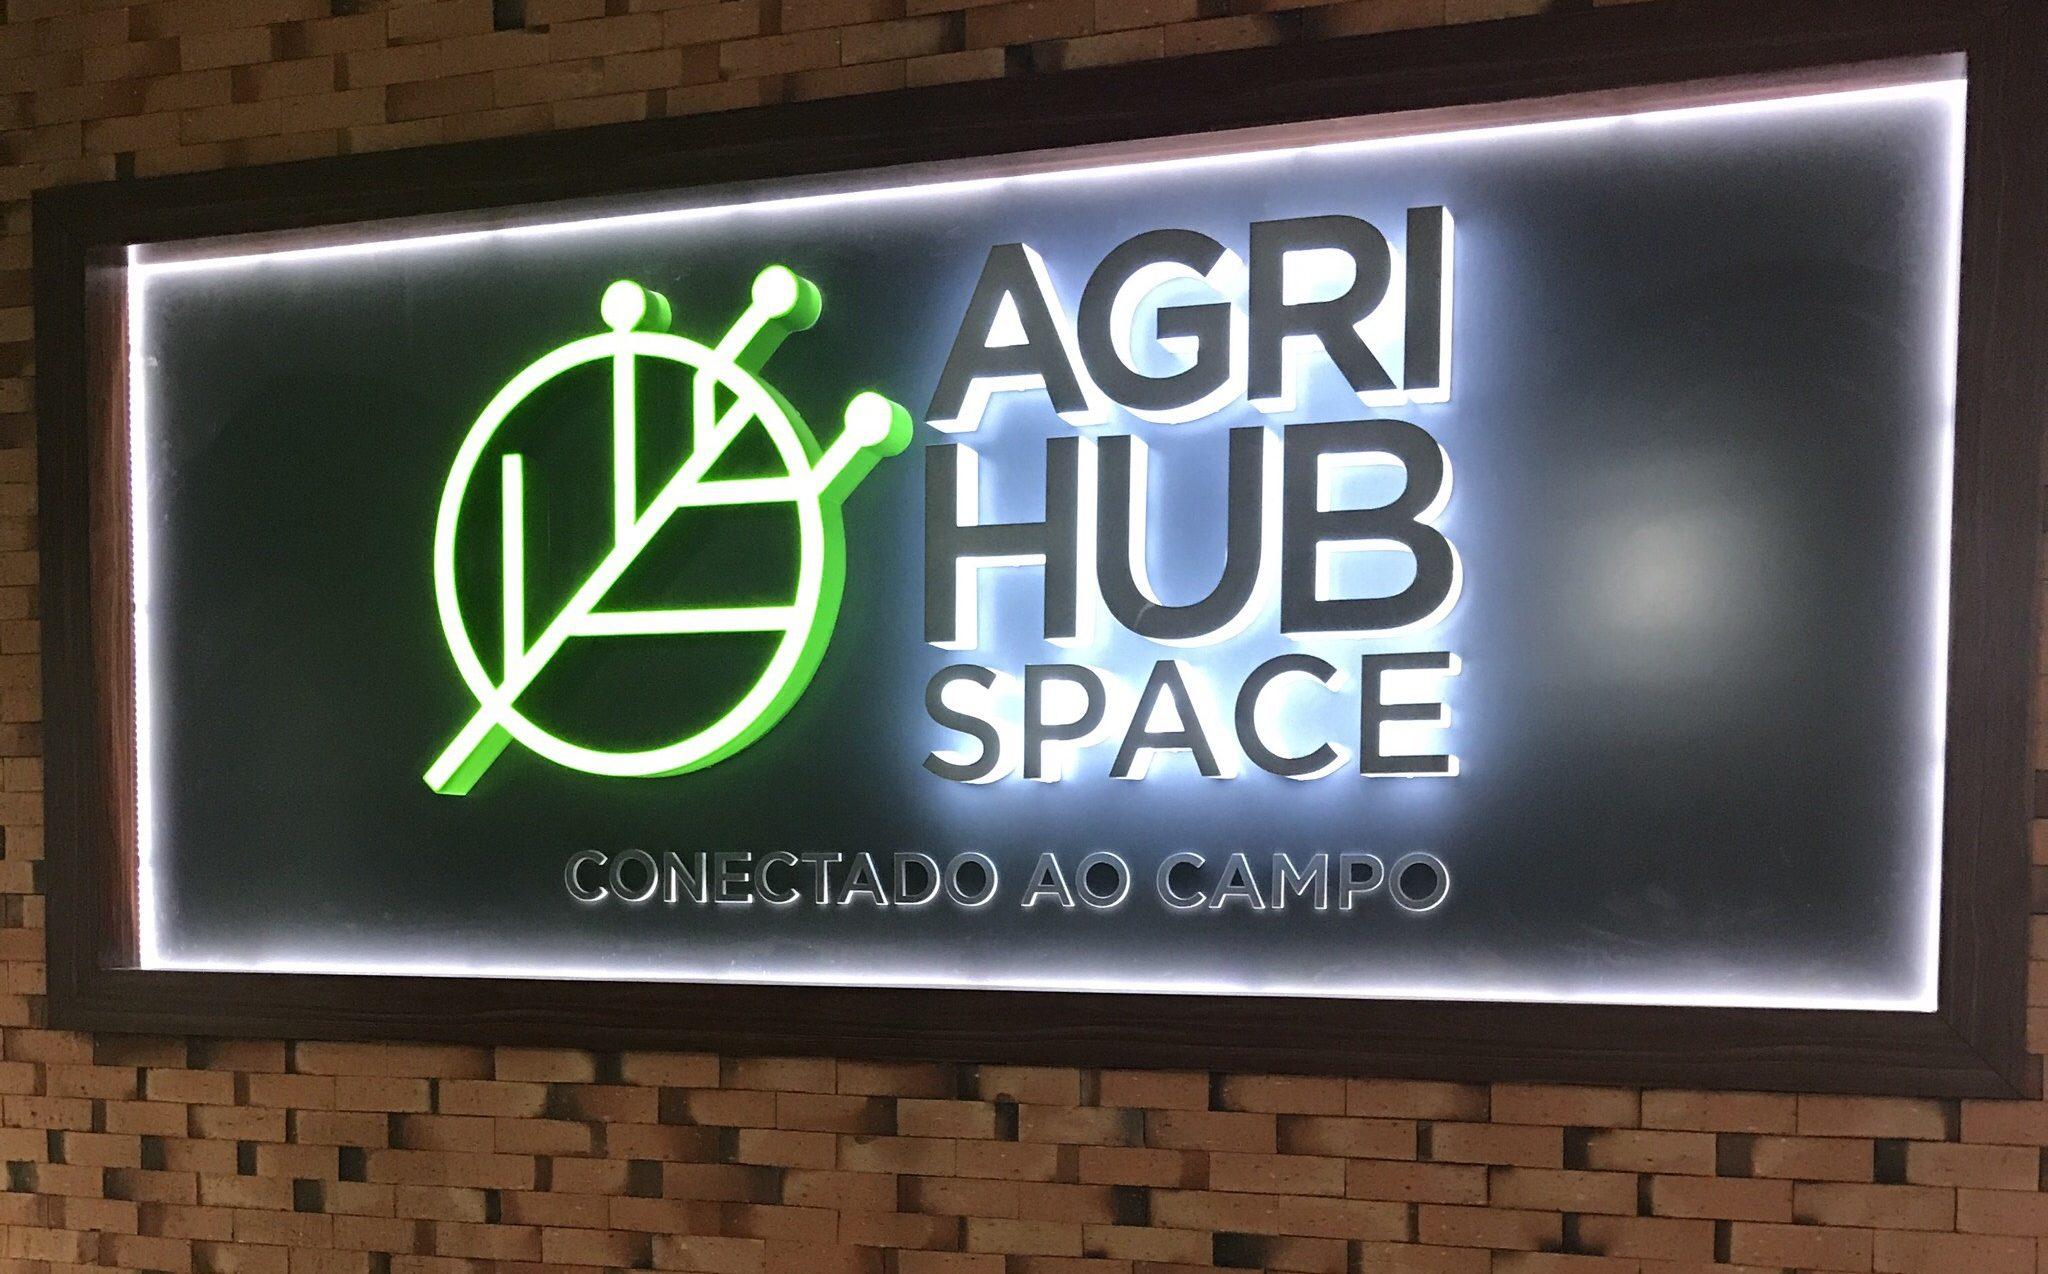 AgriHub Space